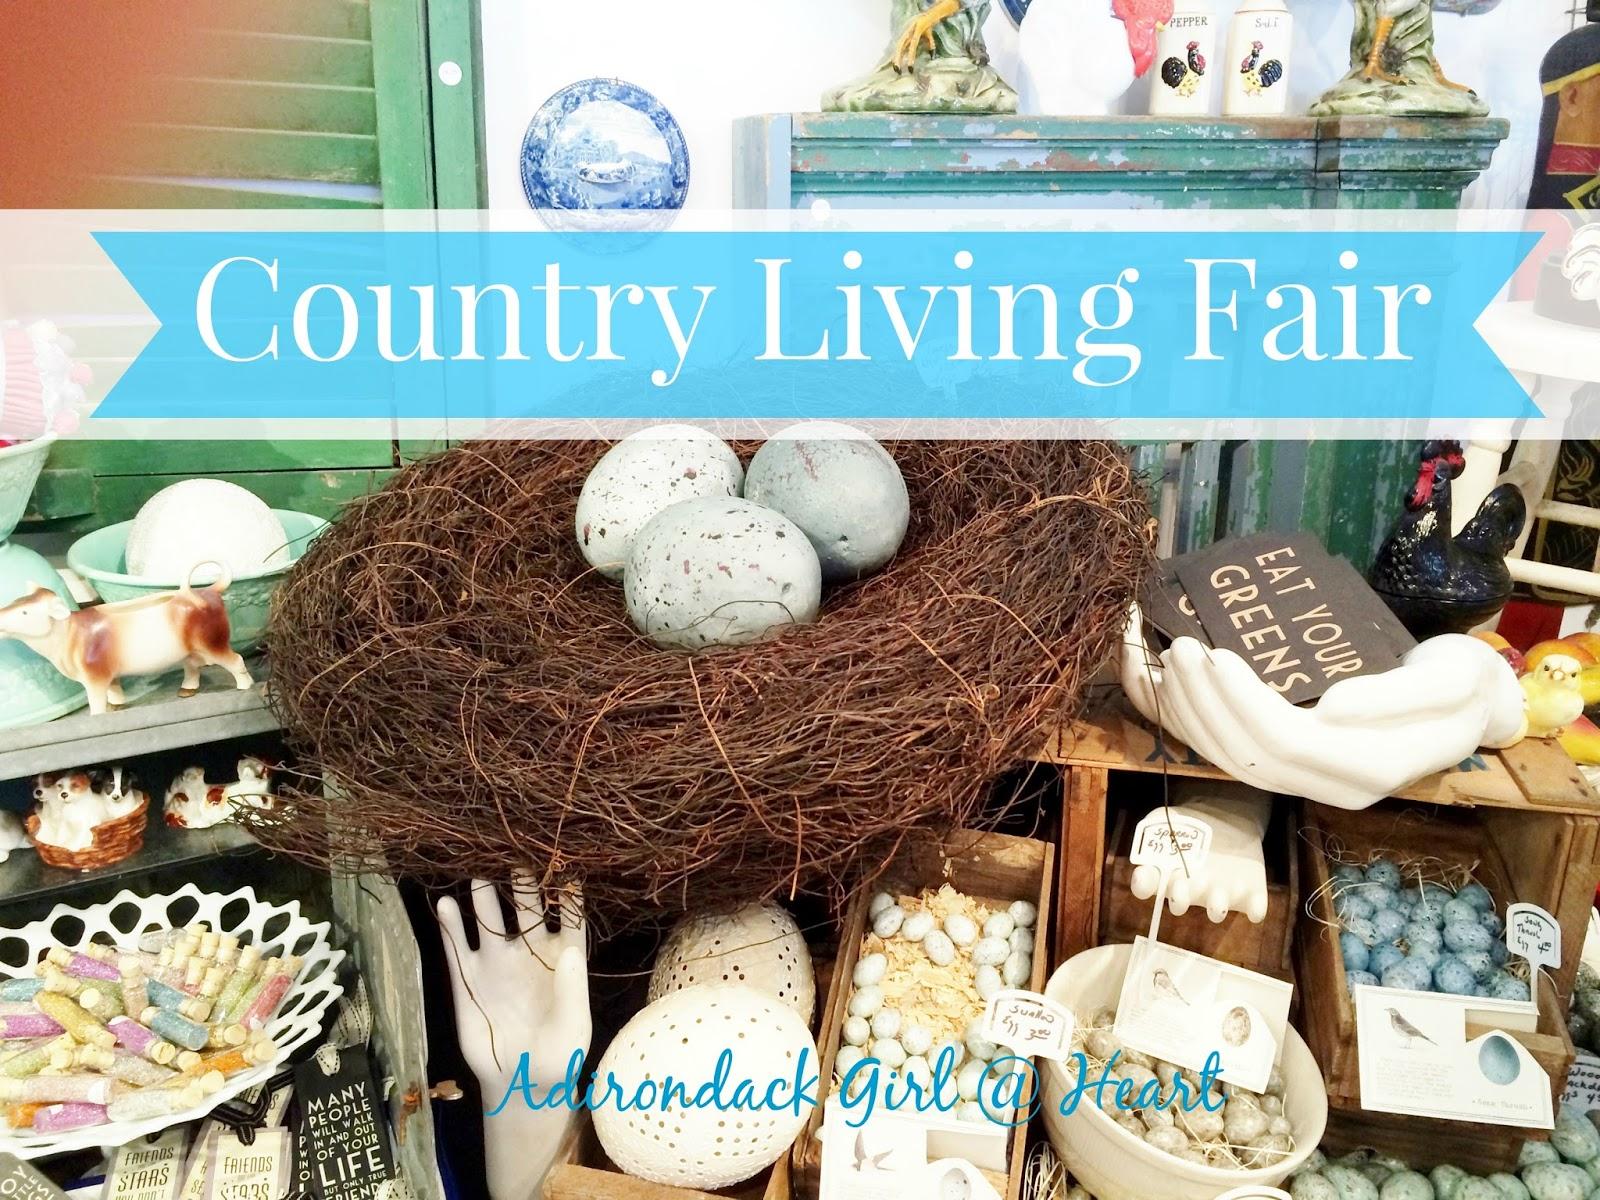 rhinebeck country living fair 2014